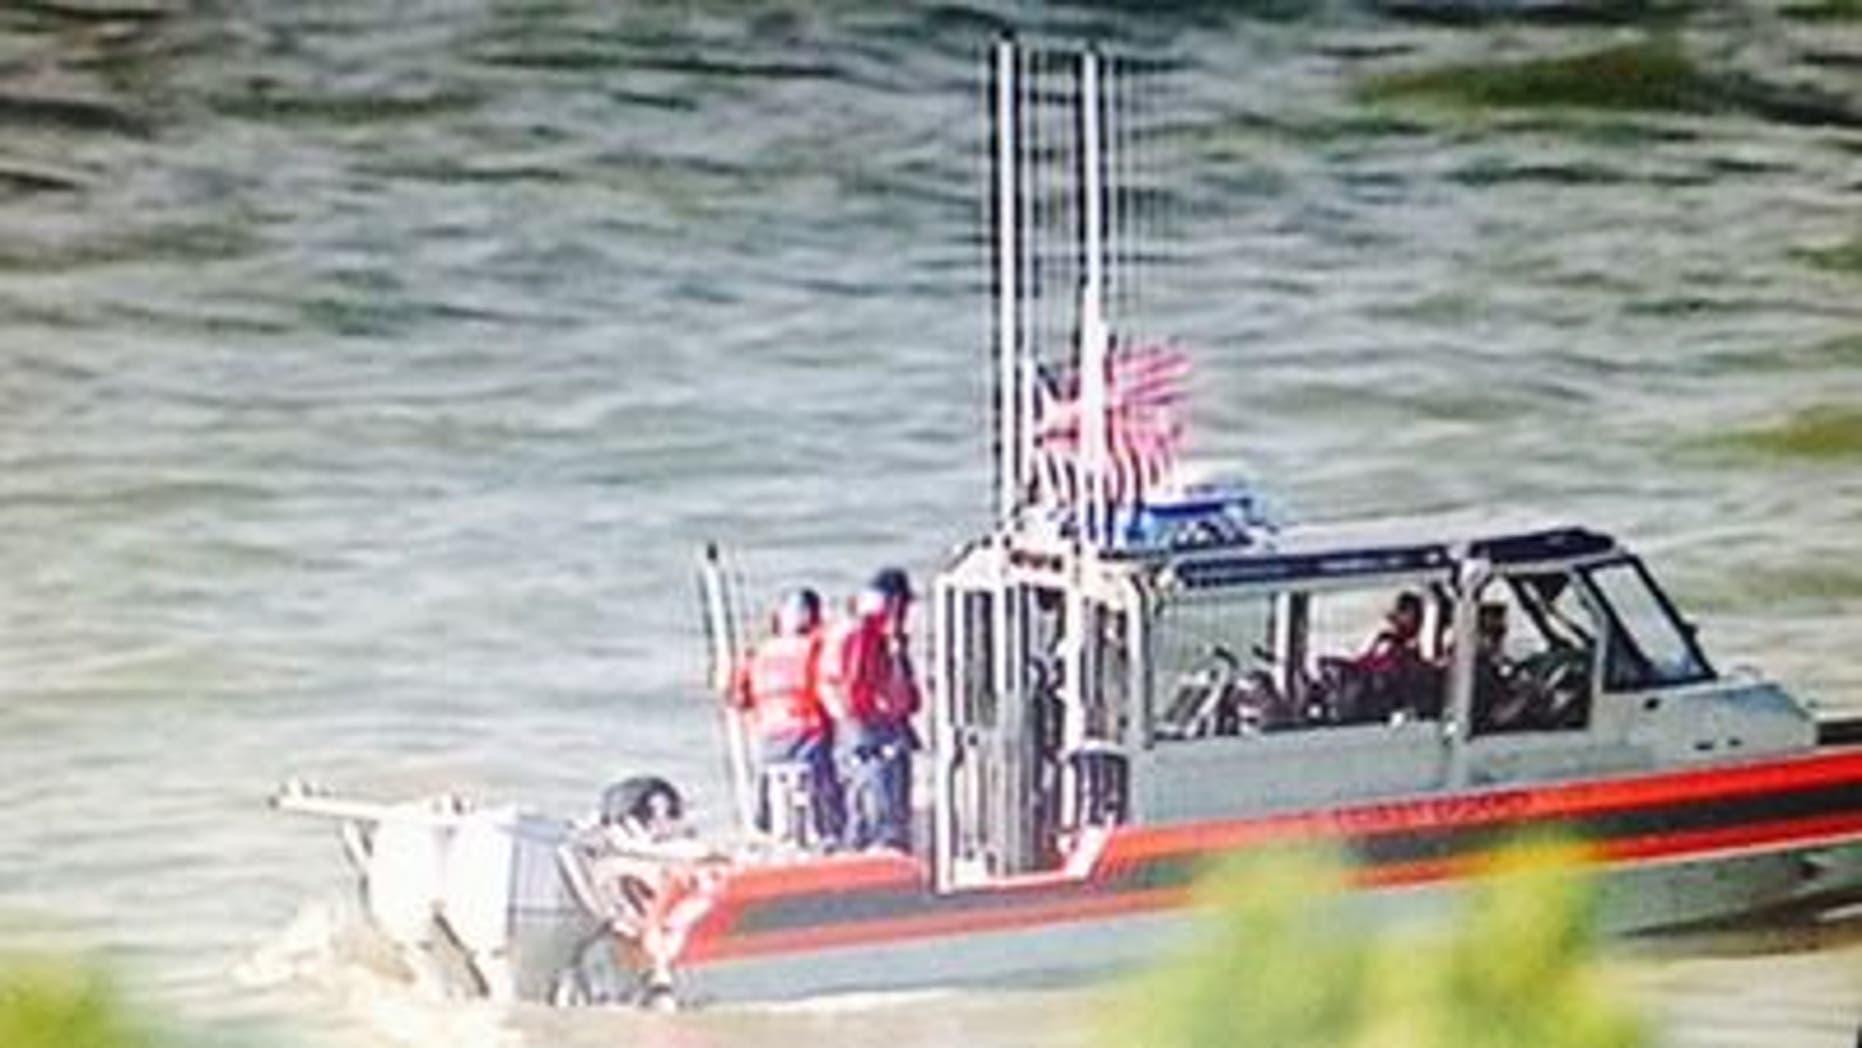 April 27, 2014: A Coast Guard vessel searches for a missing plane in San Pablo Bay (Courtesy KTVU)